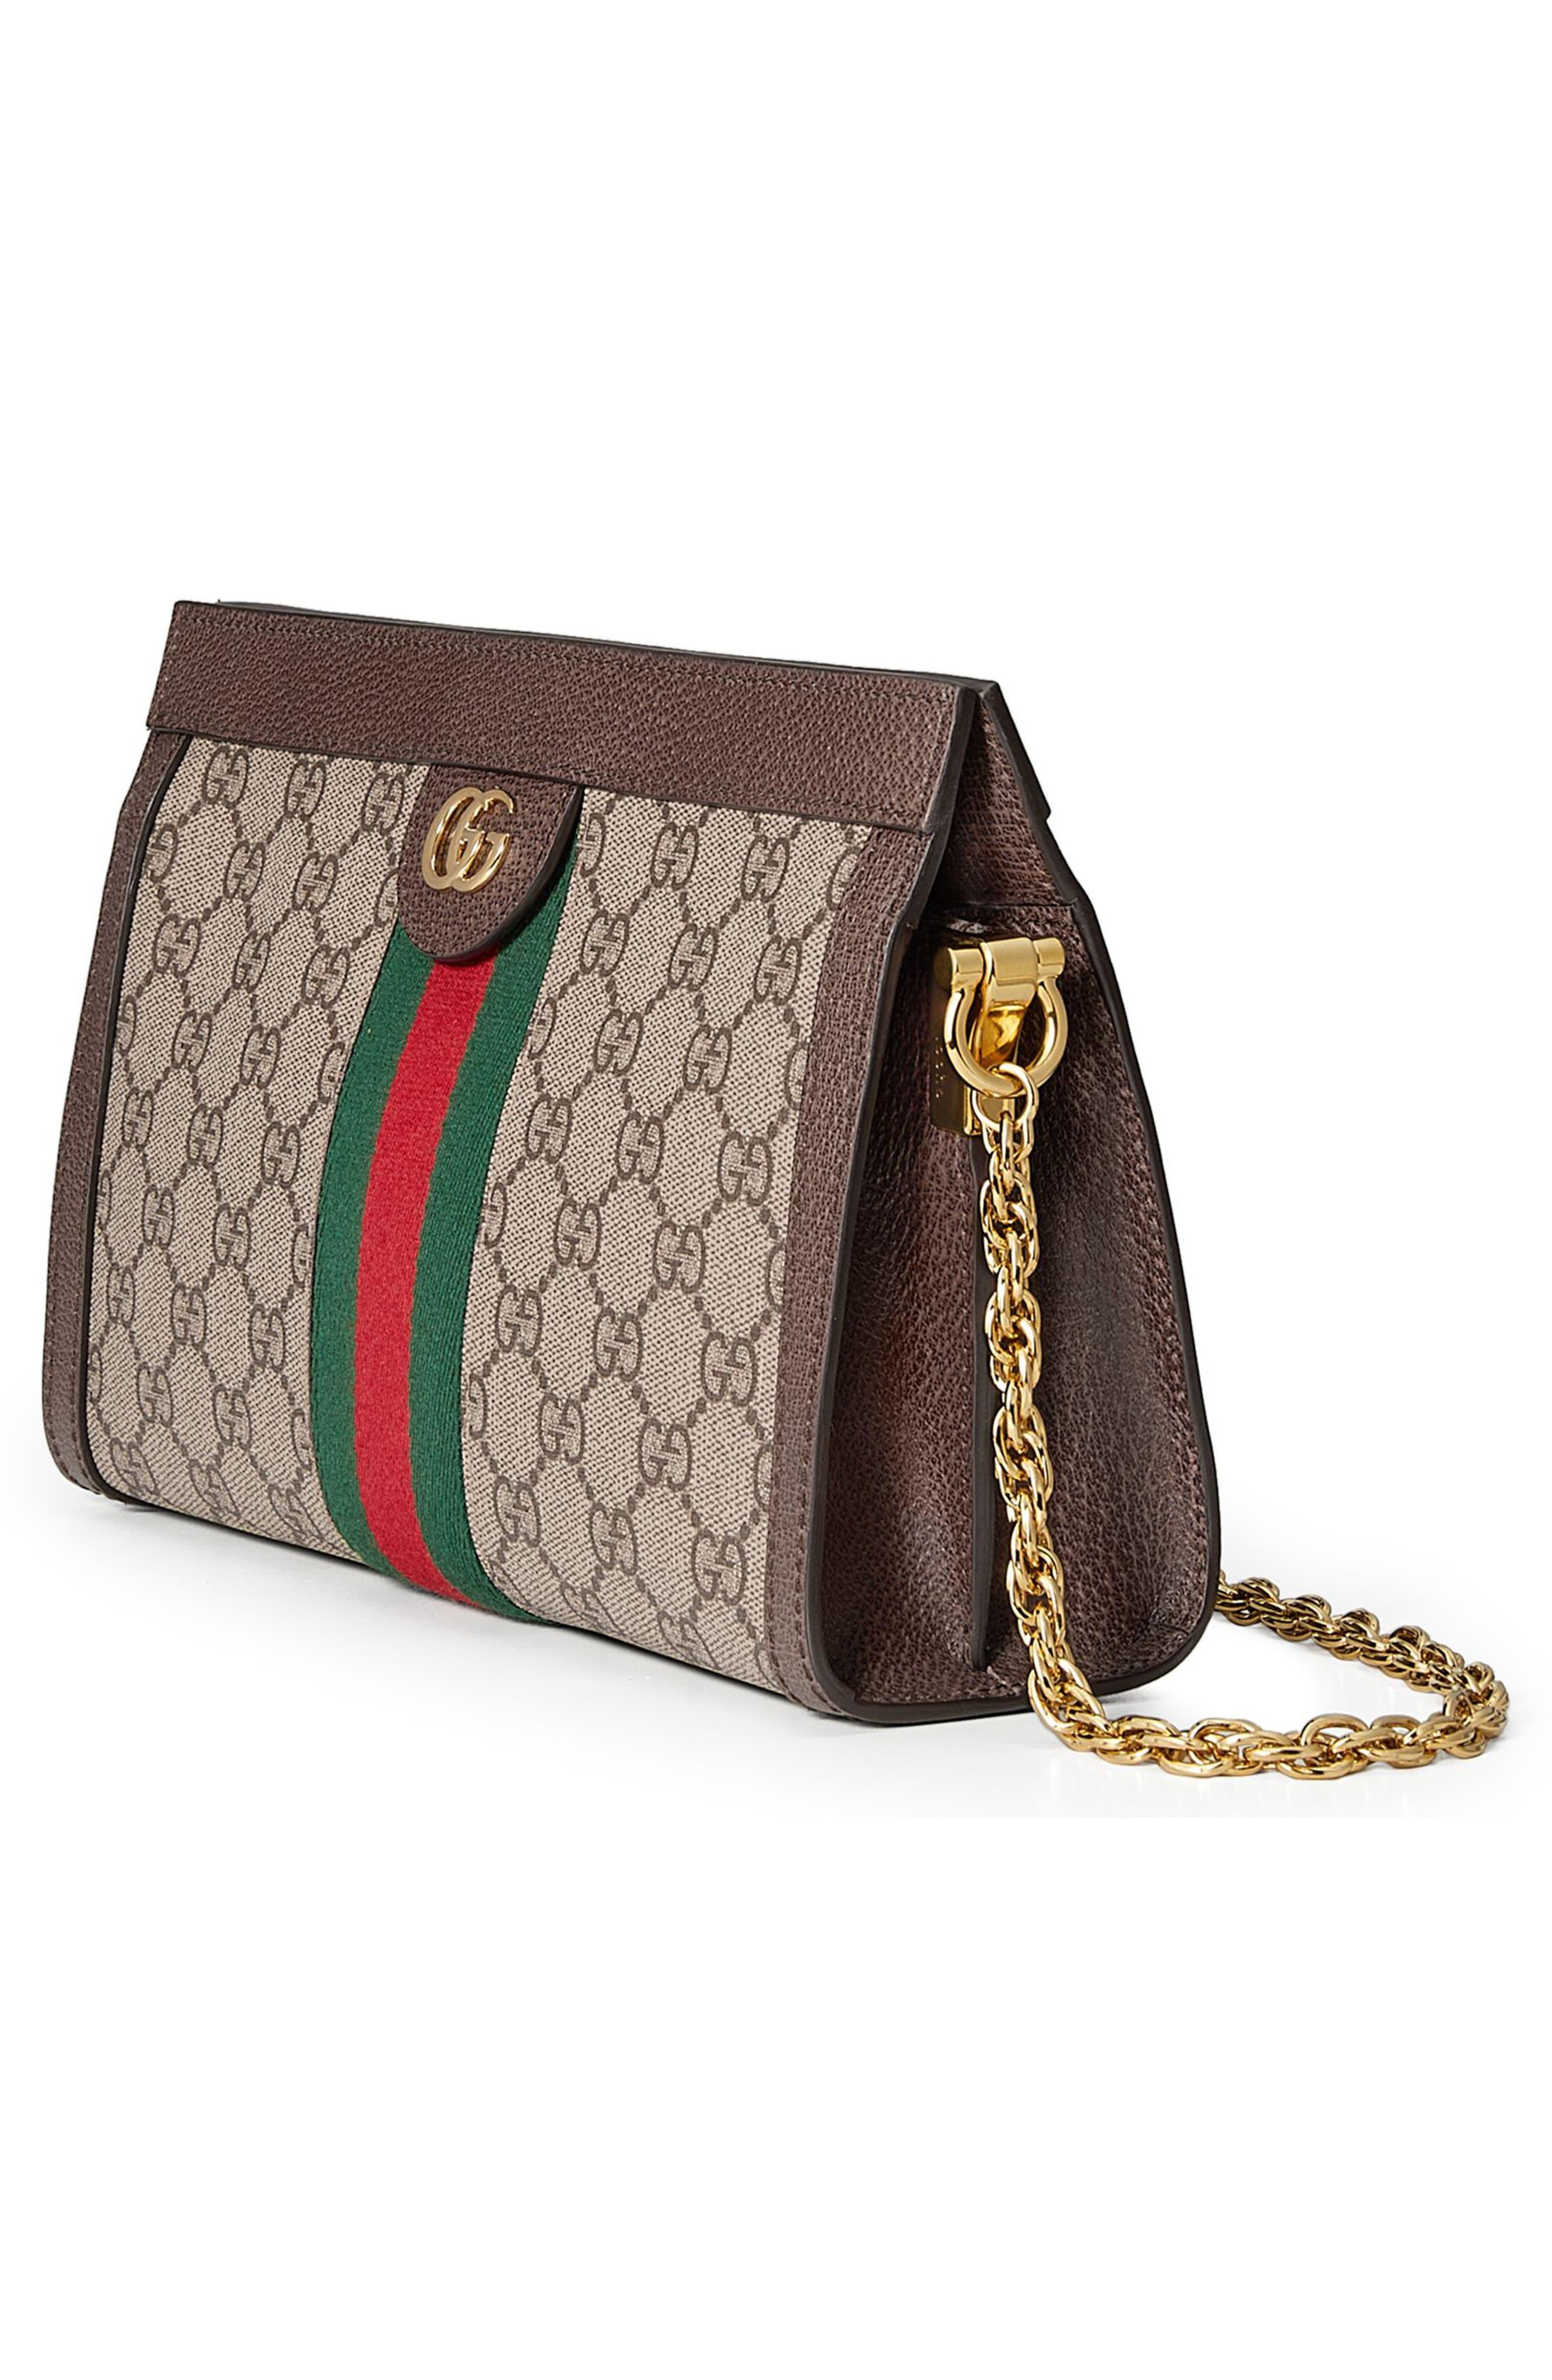 Small GG Supreme Shoulder Bag,                             Alternate thumbnail 4, color,                             BEIGE EBONY/ NERO/ VERT/ RED